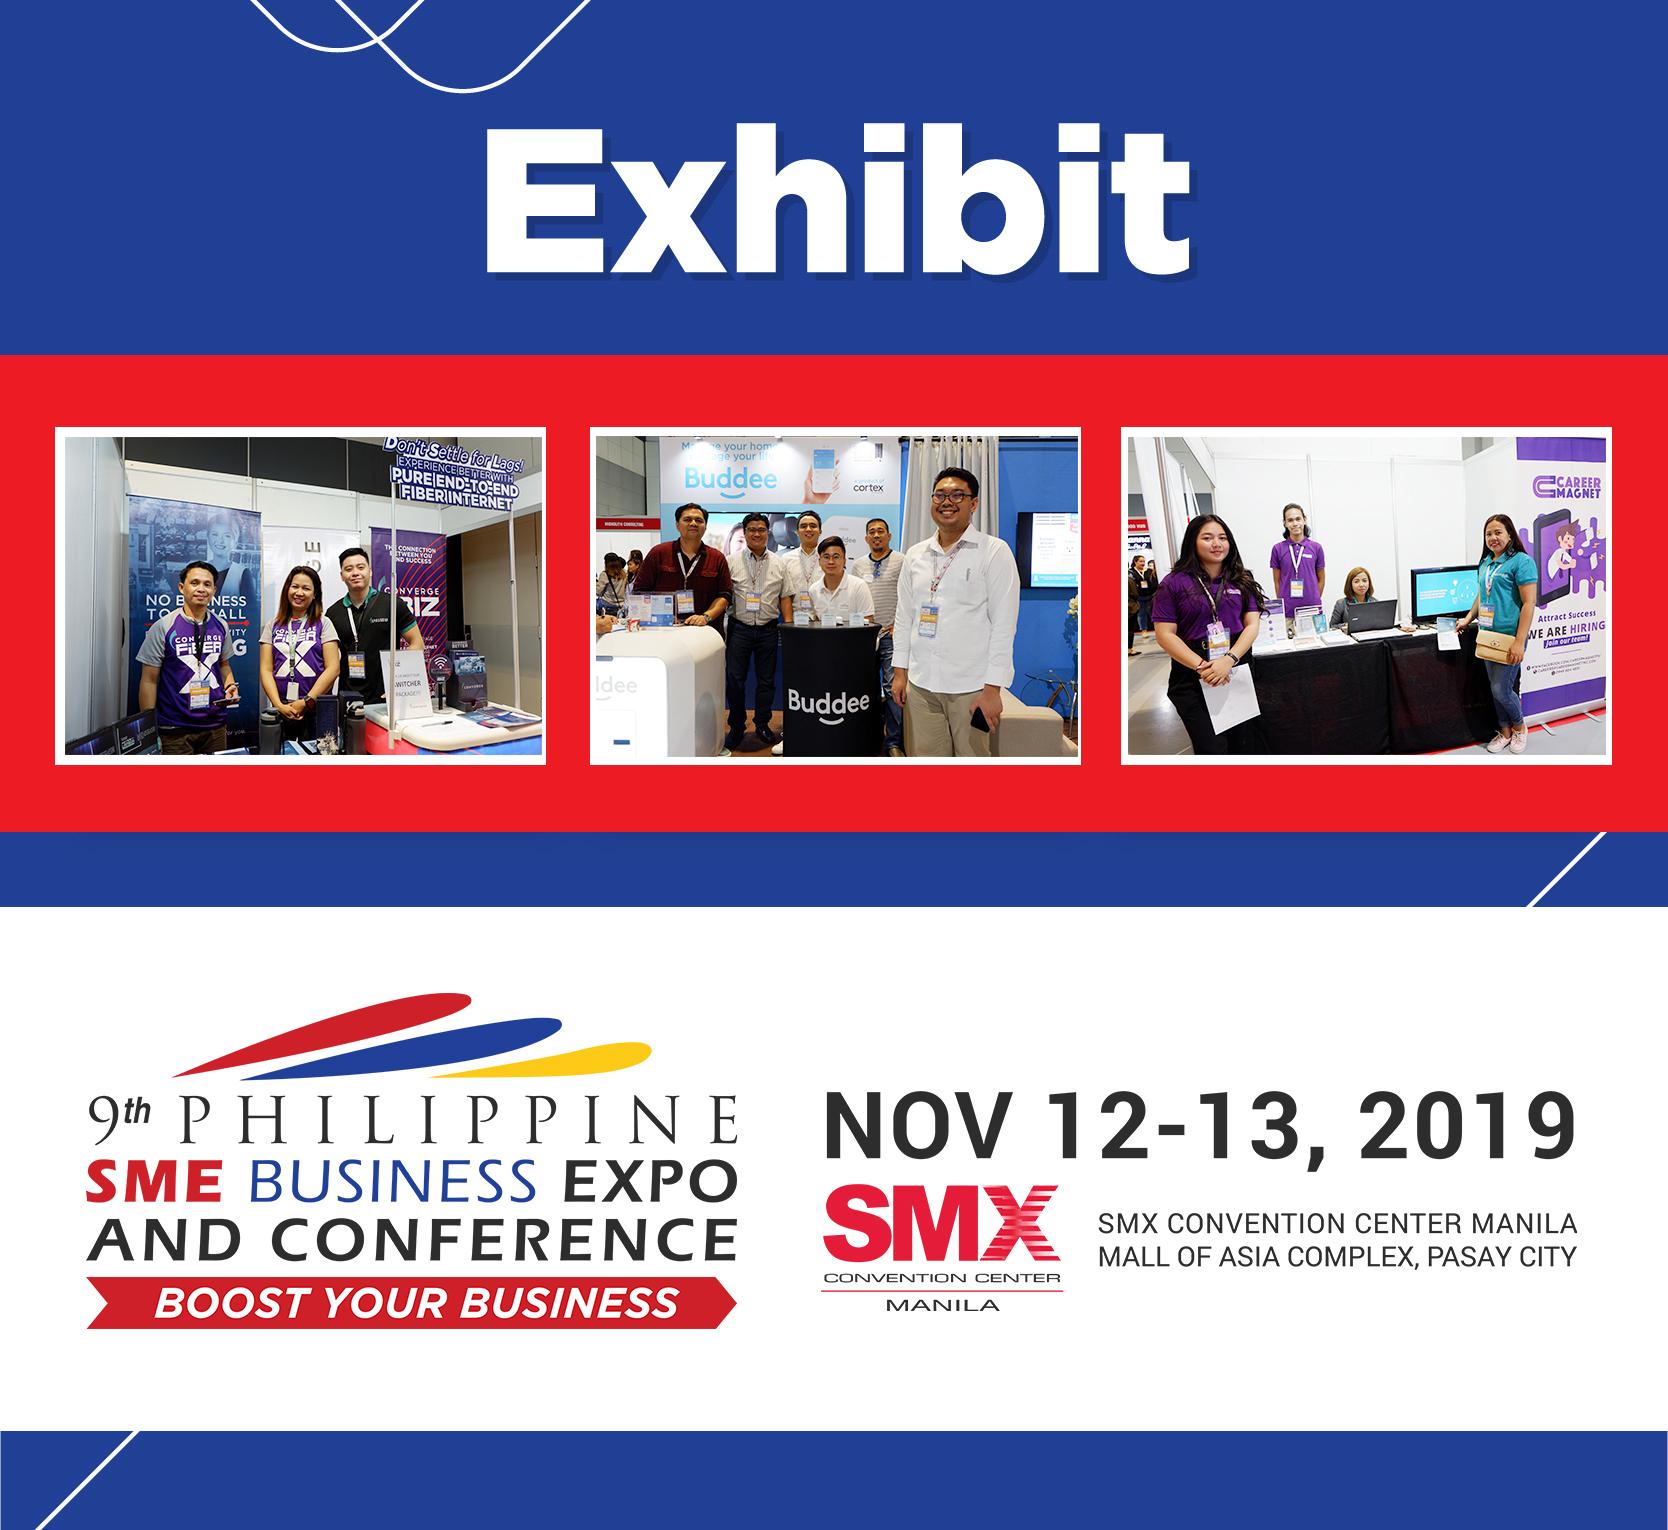 Exhibit at Philippine SME Business Expo